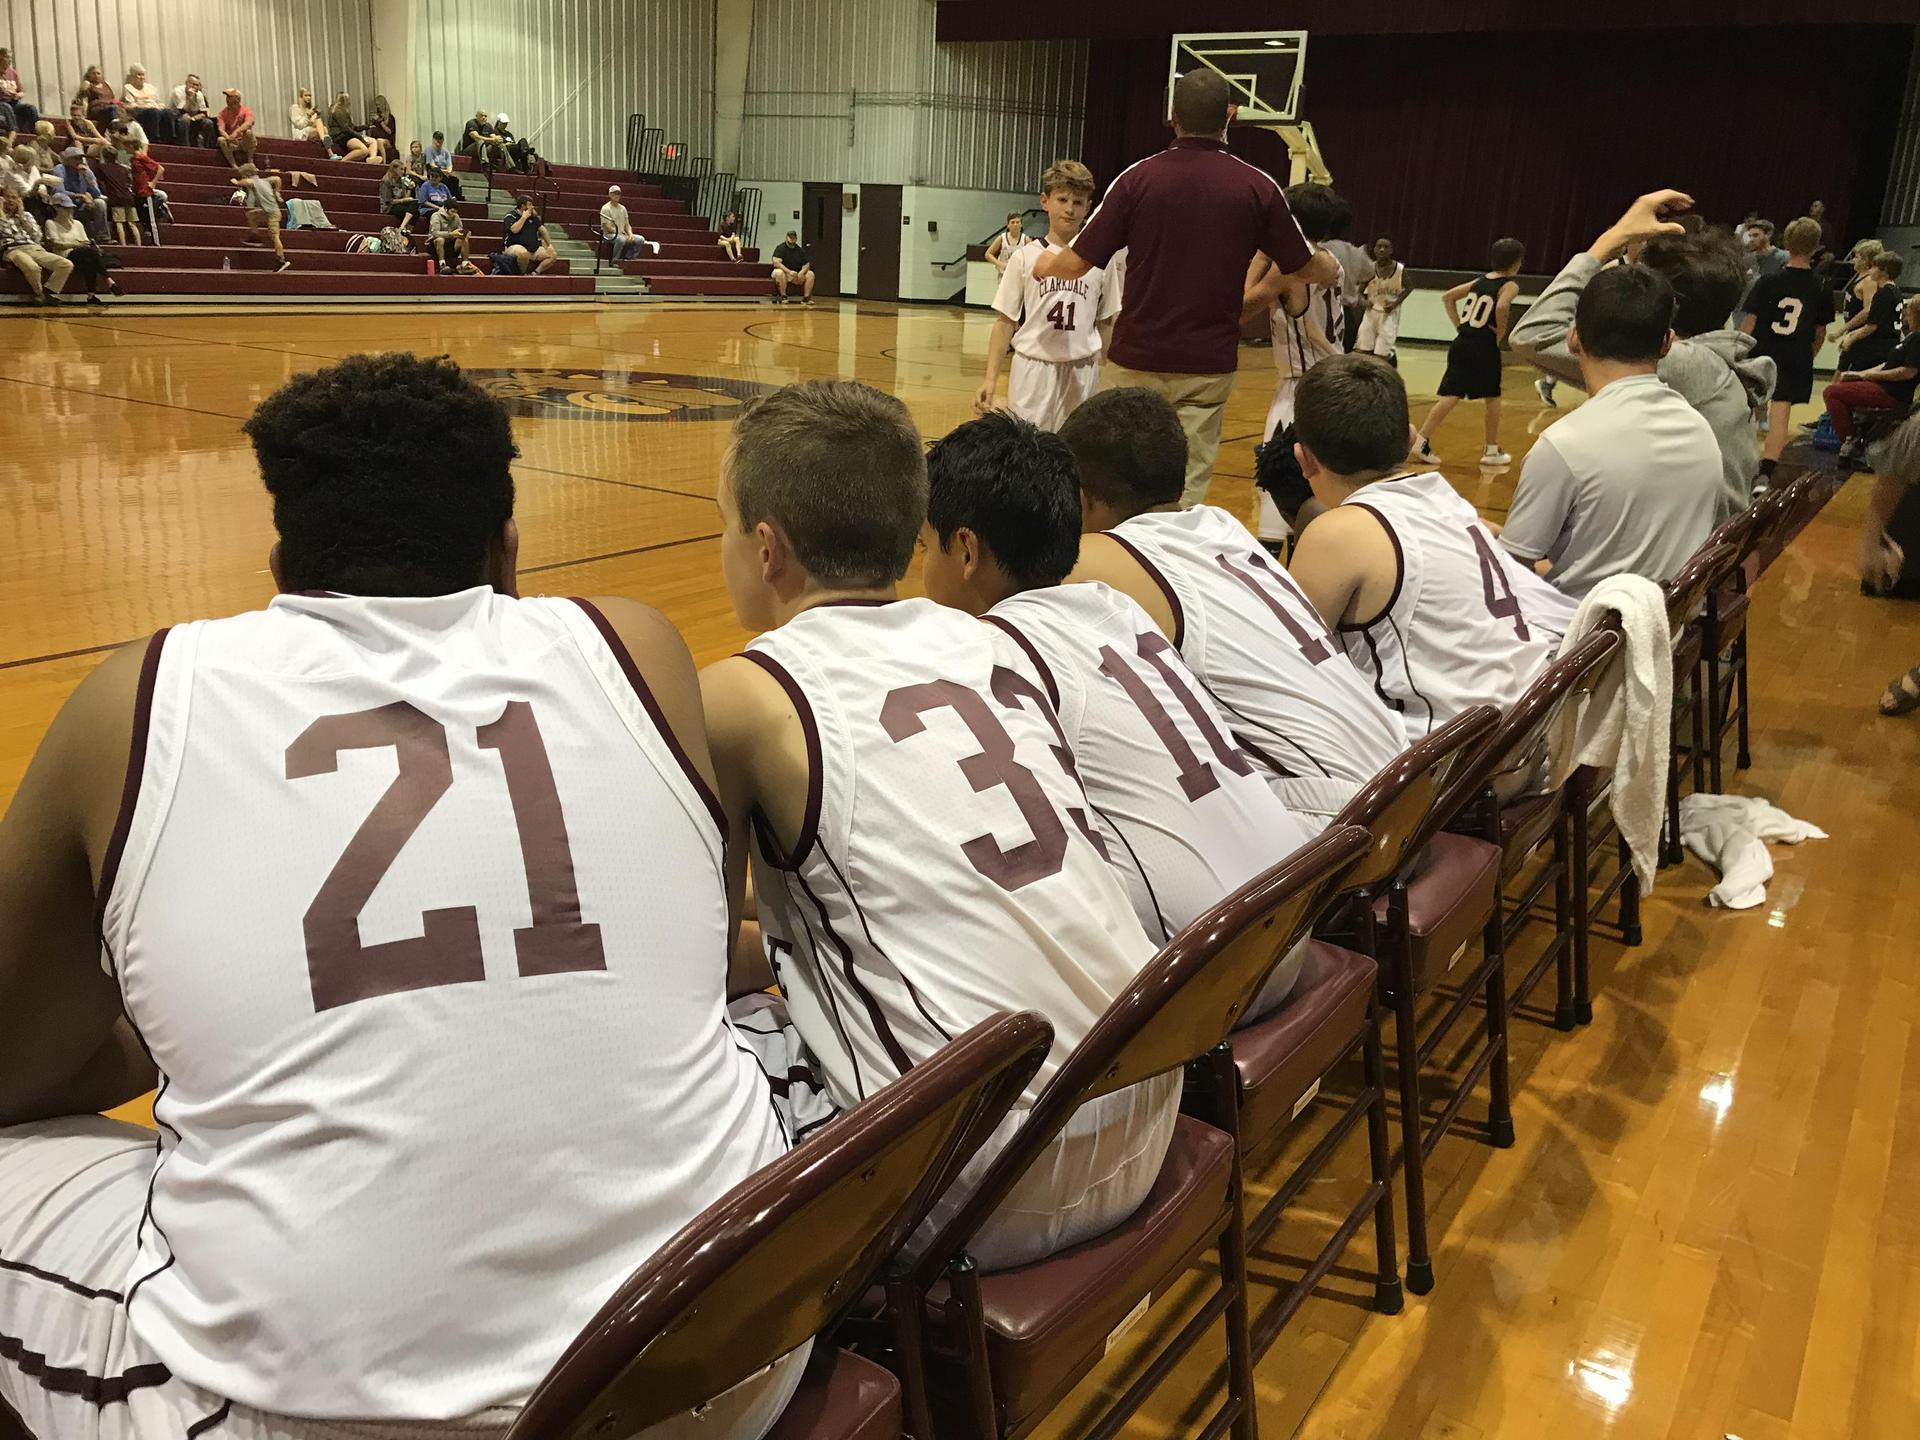 Clarkdale Middle School Boys Basketball Team